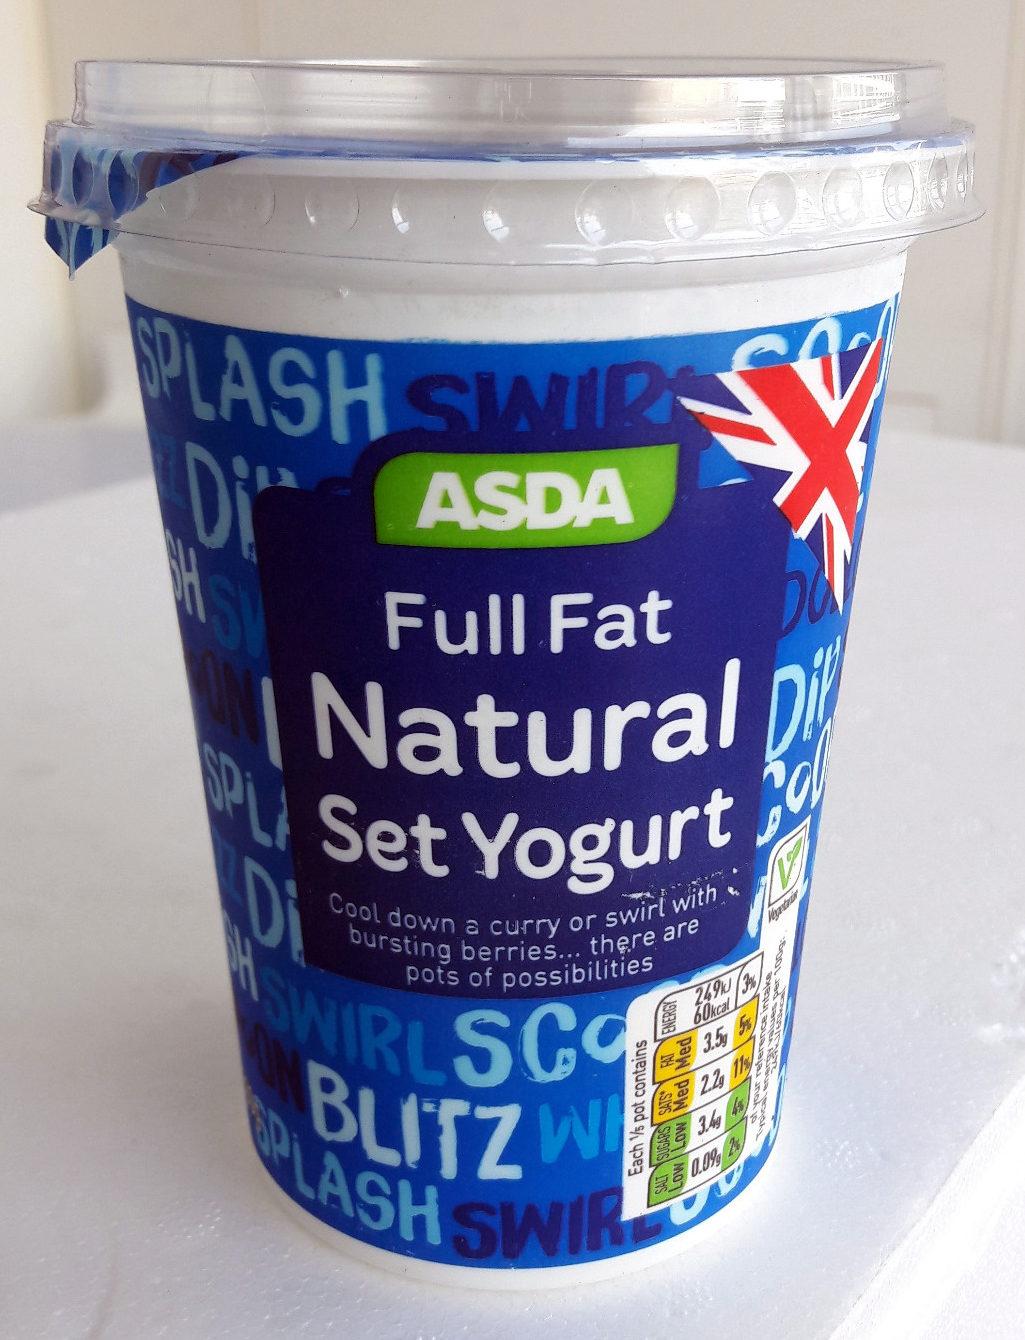 ASDA Full Fat Natural Set Yogurt - Product